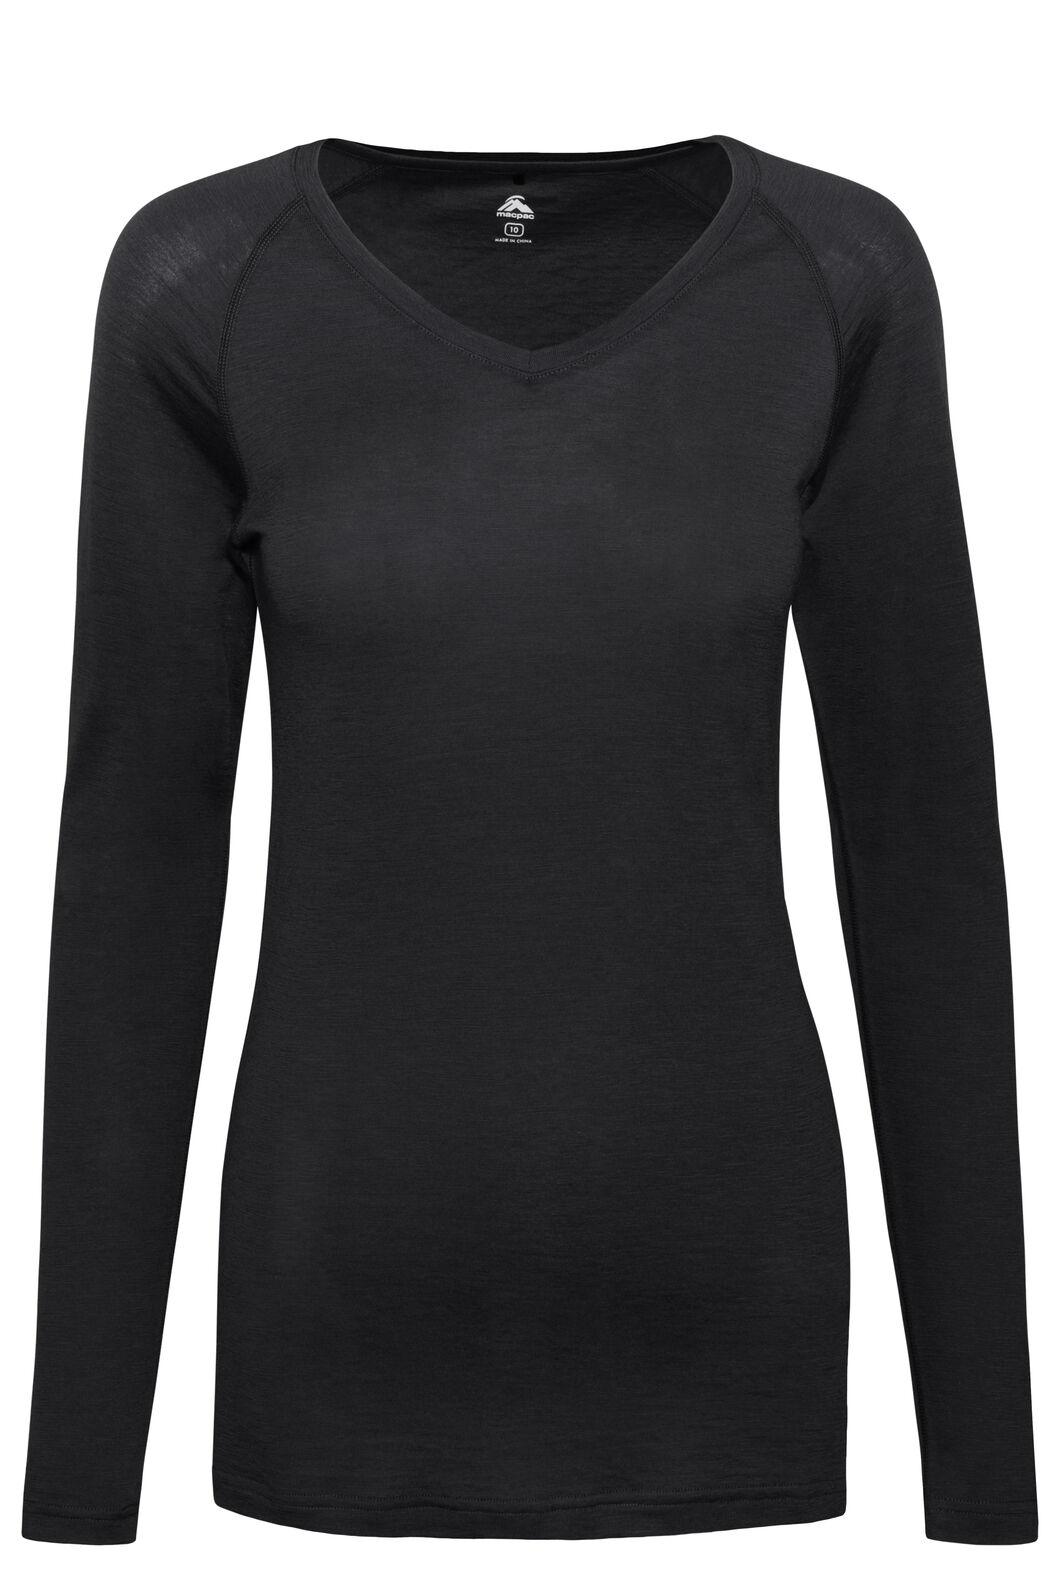 Macpac Women's 150 Merino V-Neck Top, Black, hi-res